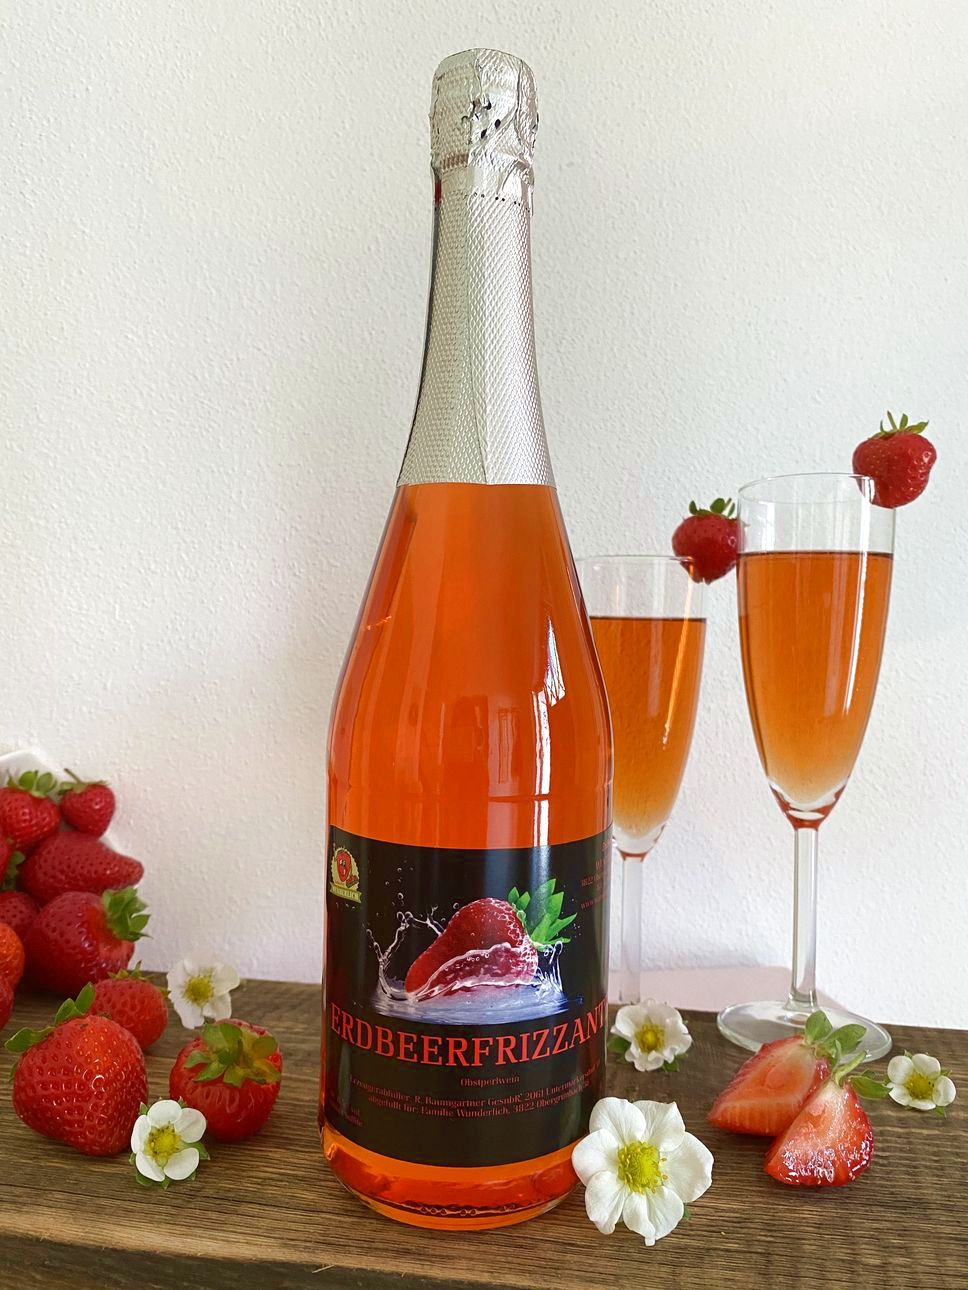 Erdbeer-Frizzante 0,75l   Erdbeerhof Wunderlich